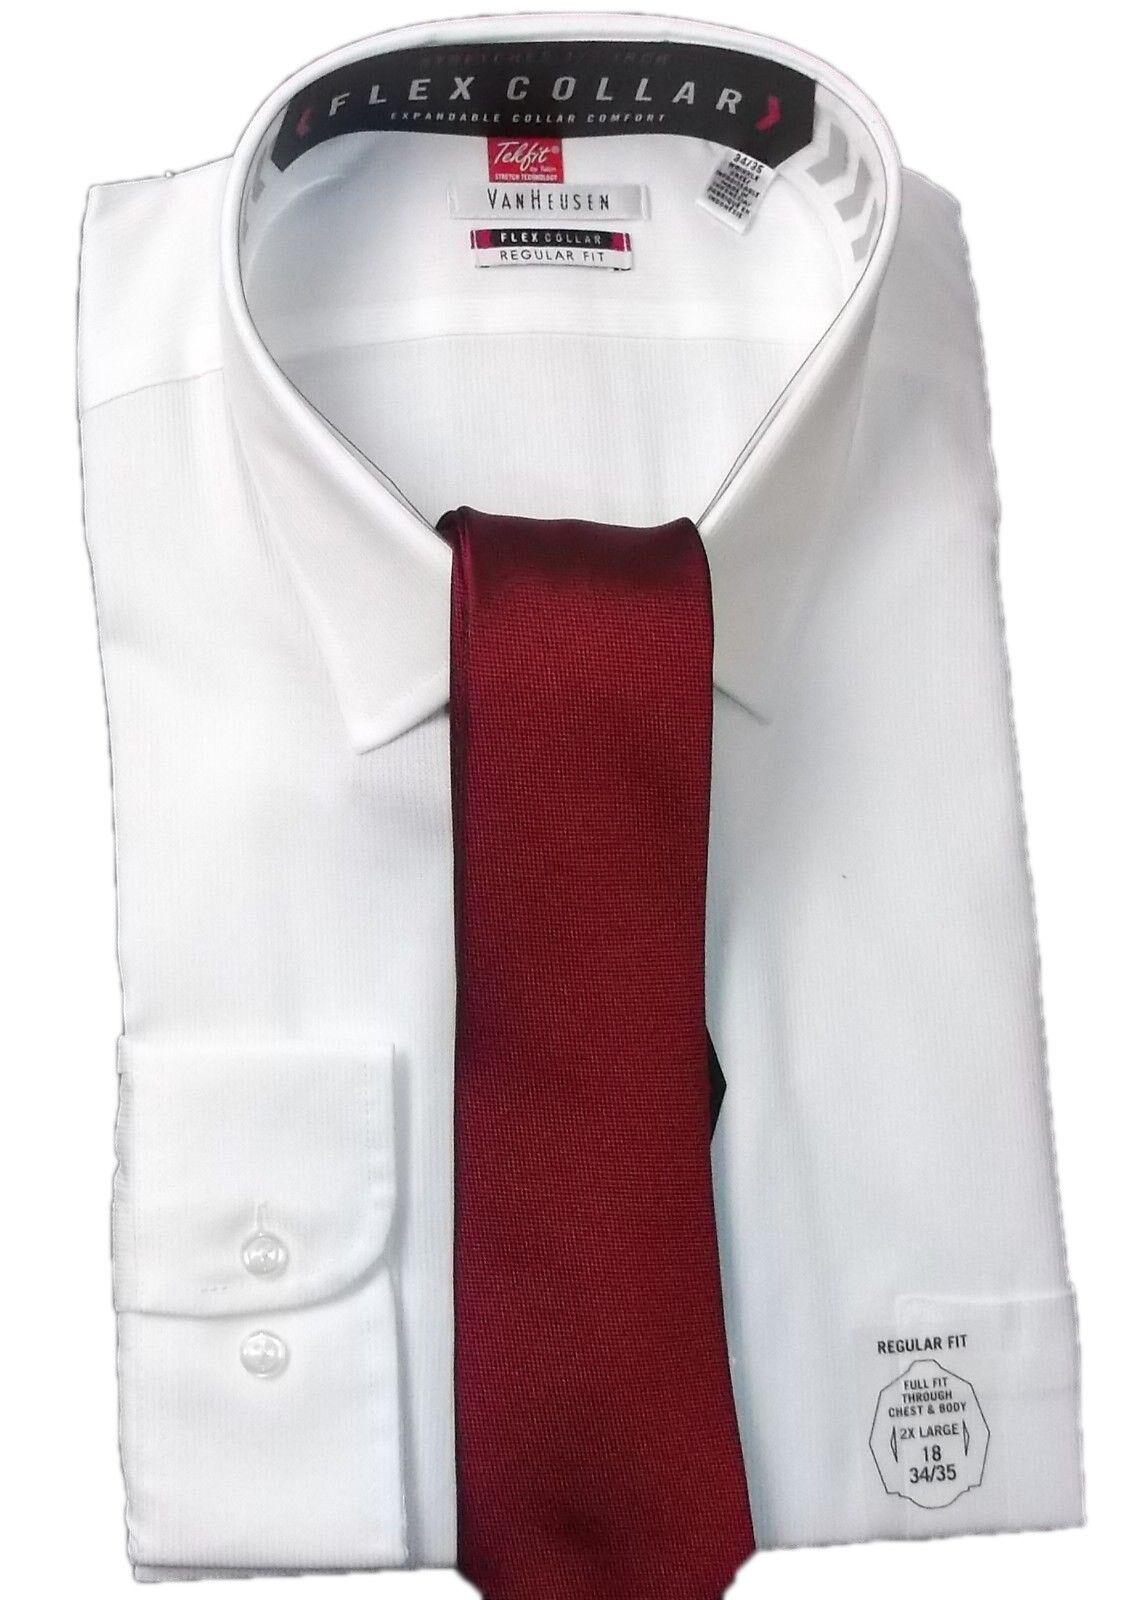 Van Heusen White Shirt & Silk Tie Set Men's Size 18 Regular Fit 34   35 New